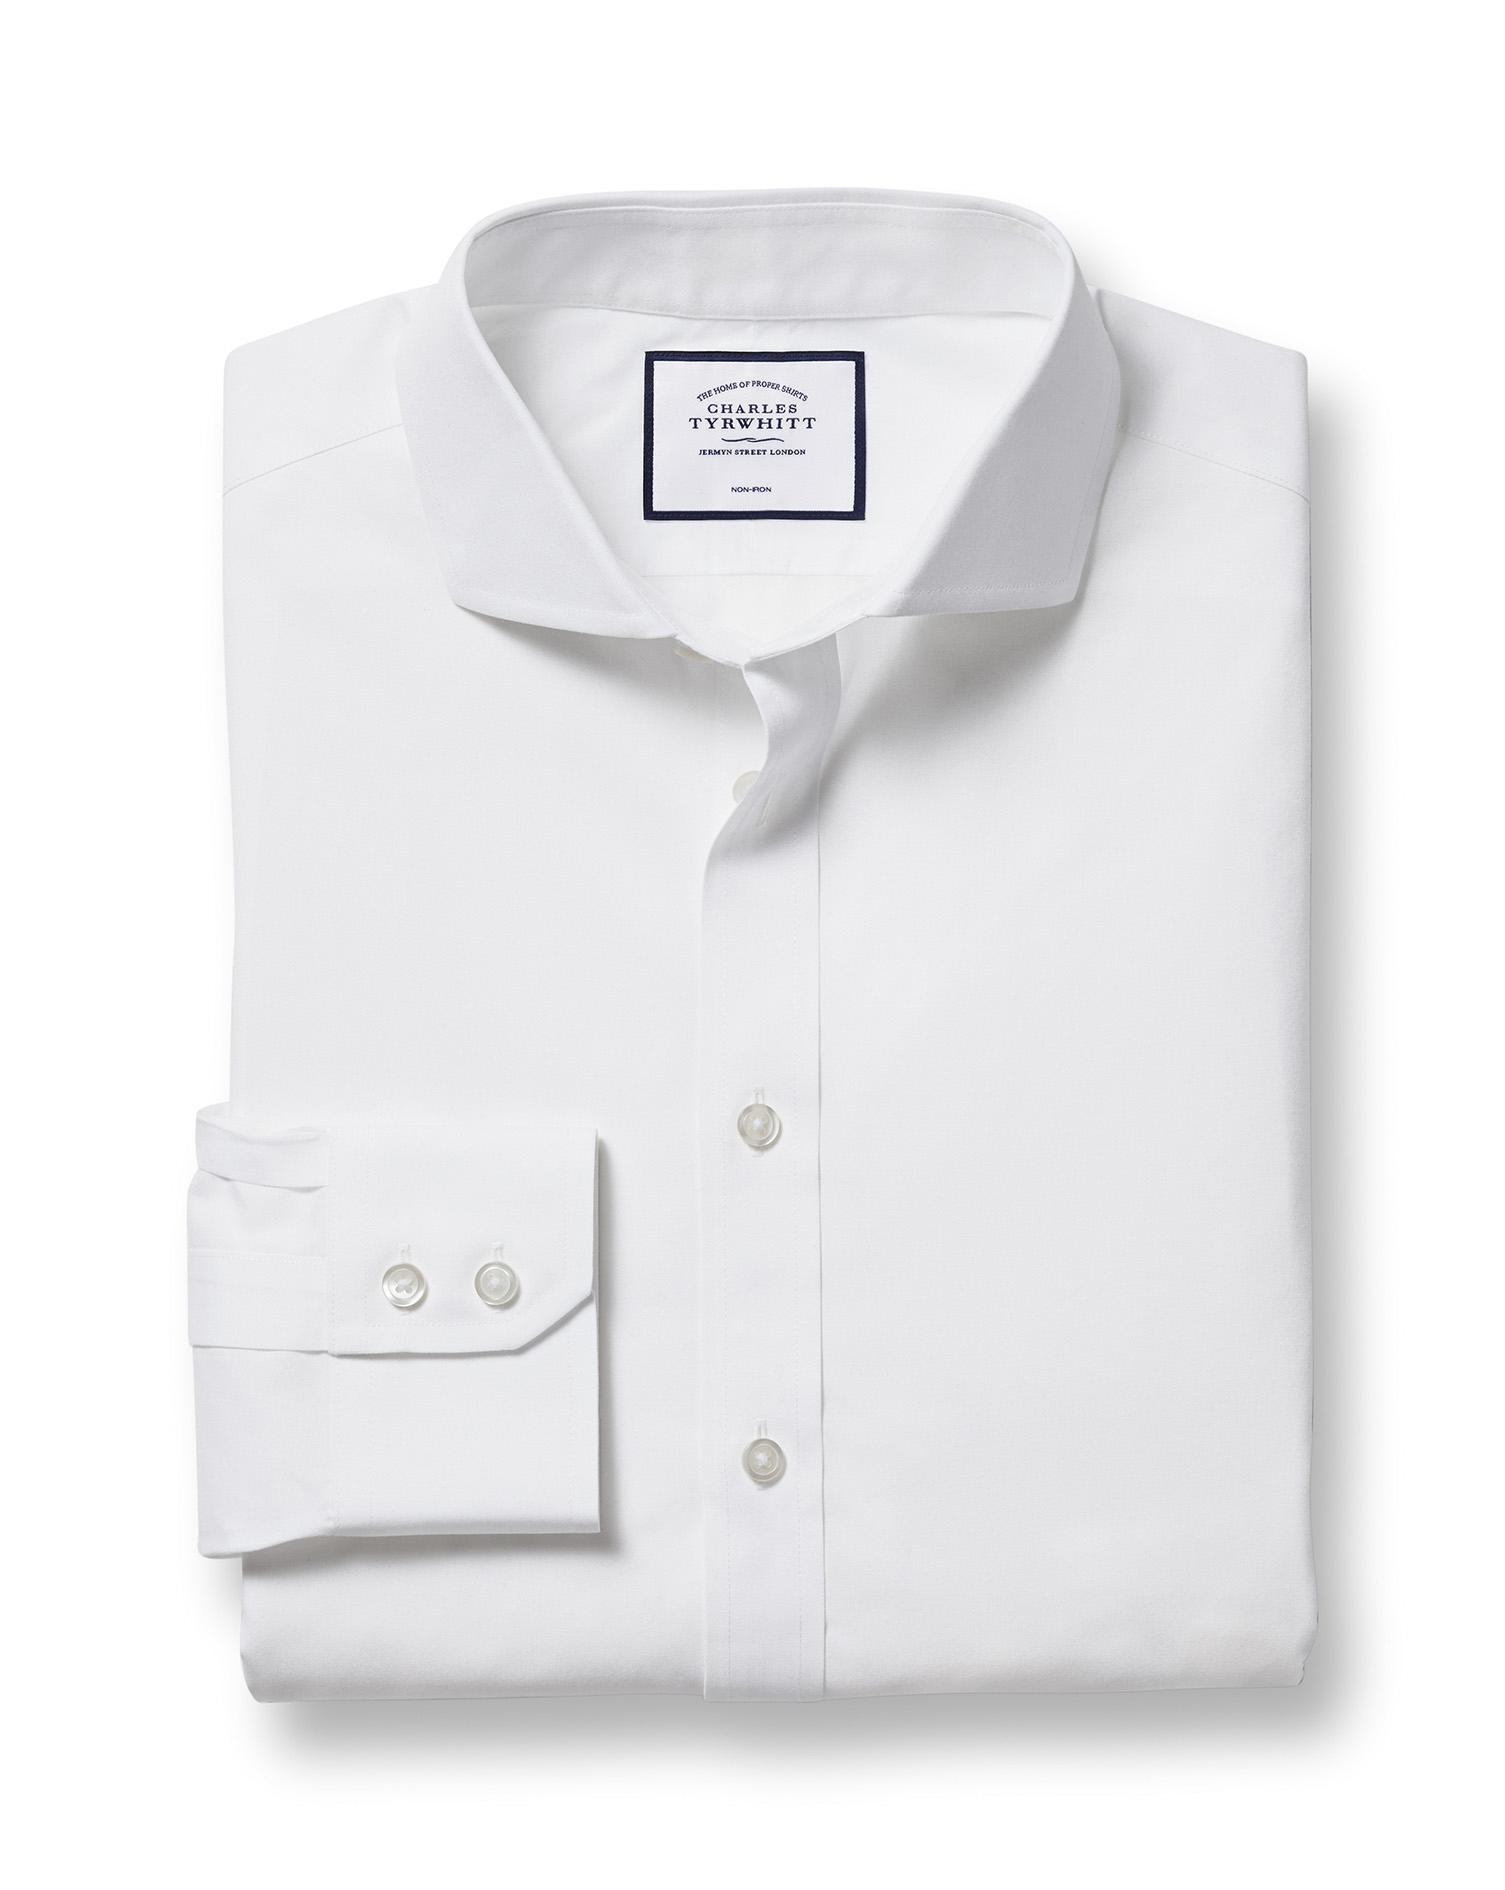 Classic Fit White Non-Iron Poplin Cutaway Collar Cotton Formal Shirt Single Cuff Size 15/34 by Charl